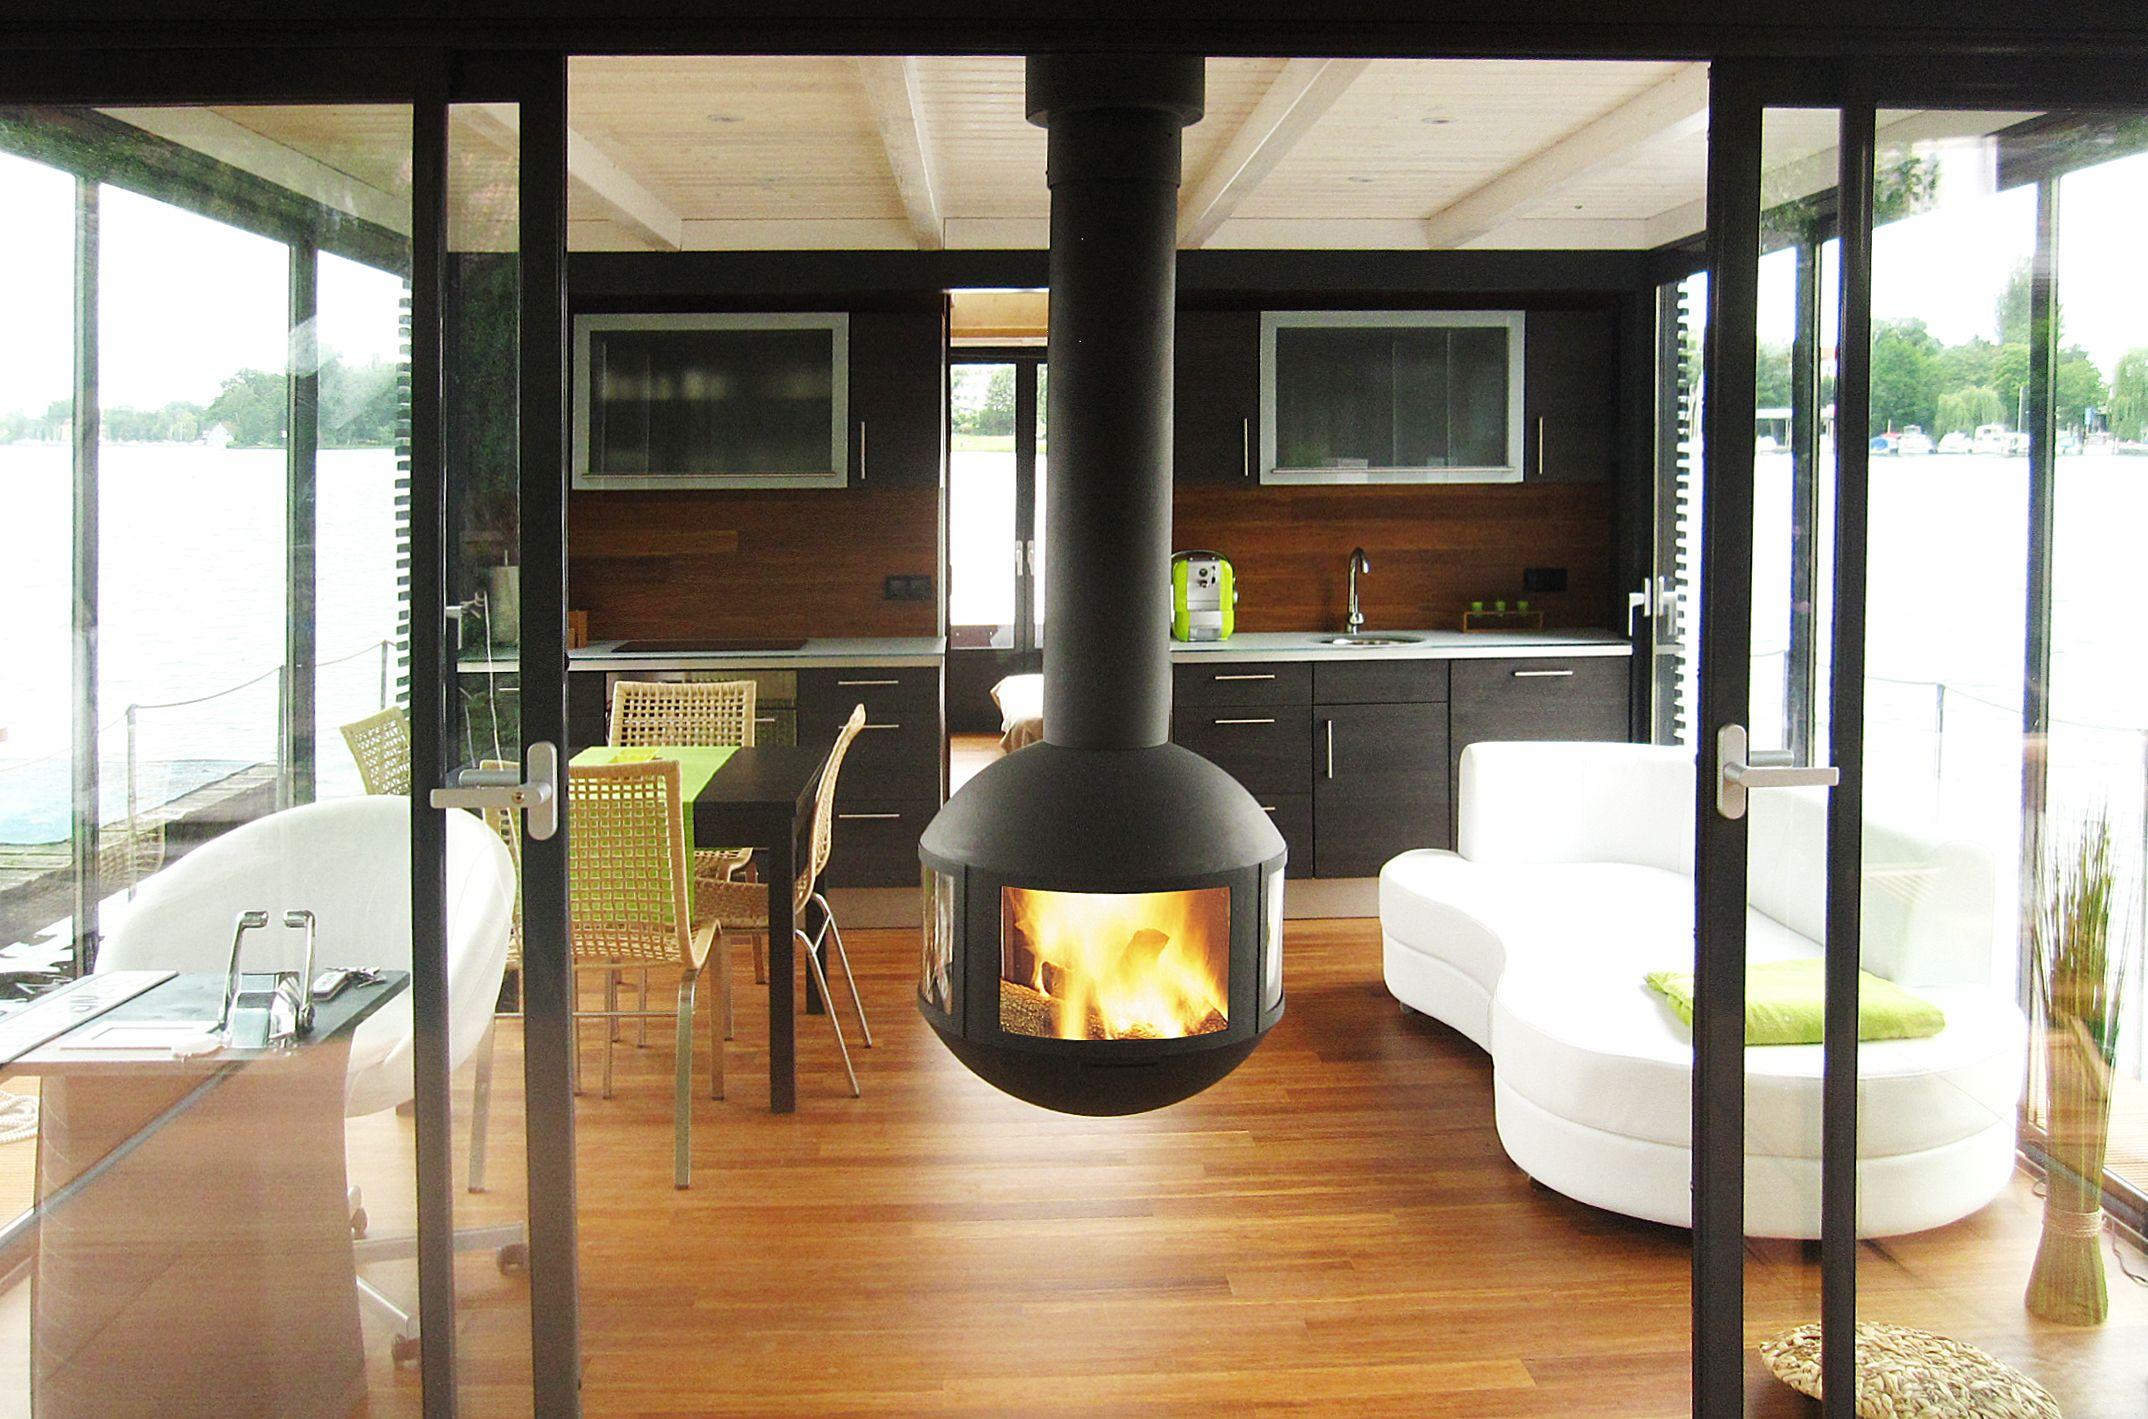 description cheminee agorafocus foyer bois suspendu ferm design contemporain focus. Black Bedroom Furniture Sets. Home Design Ideas